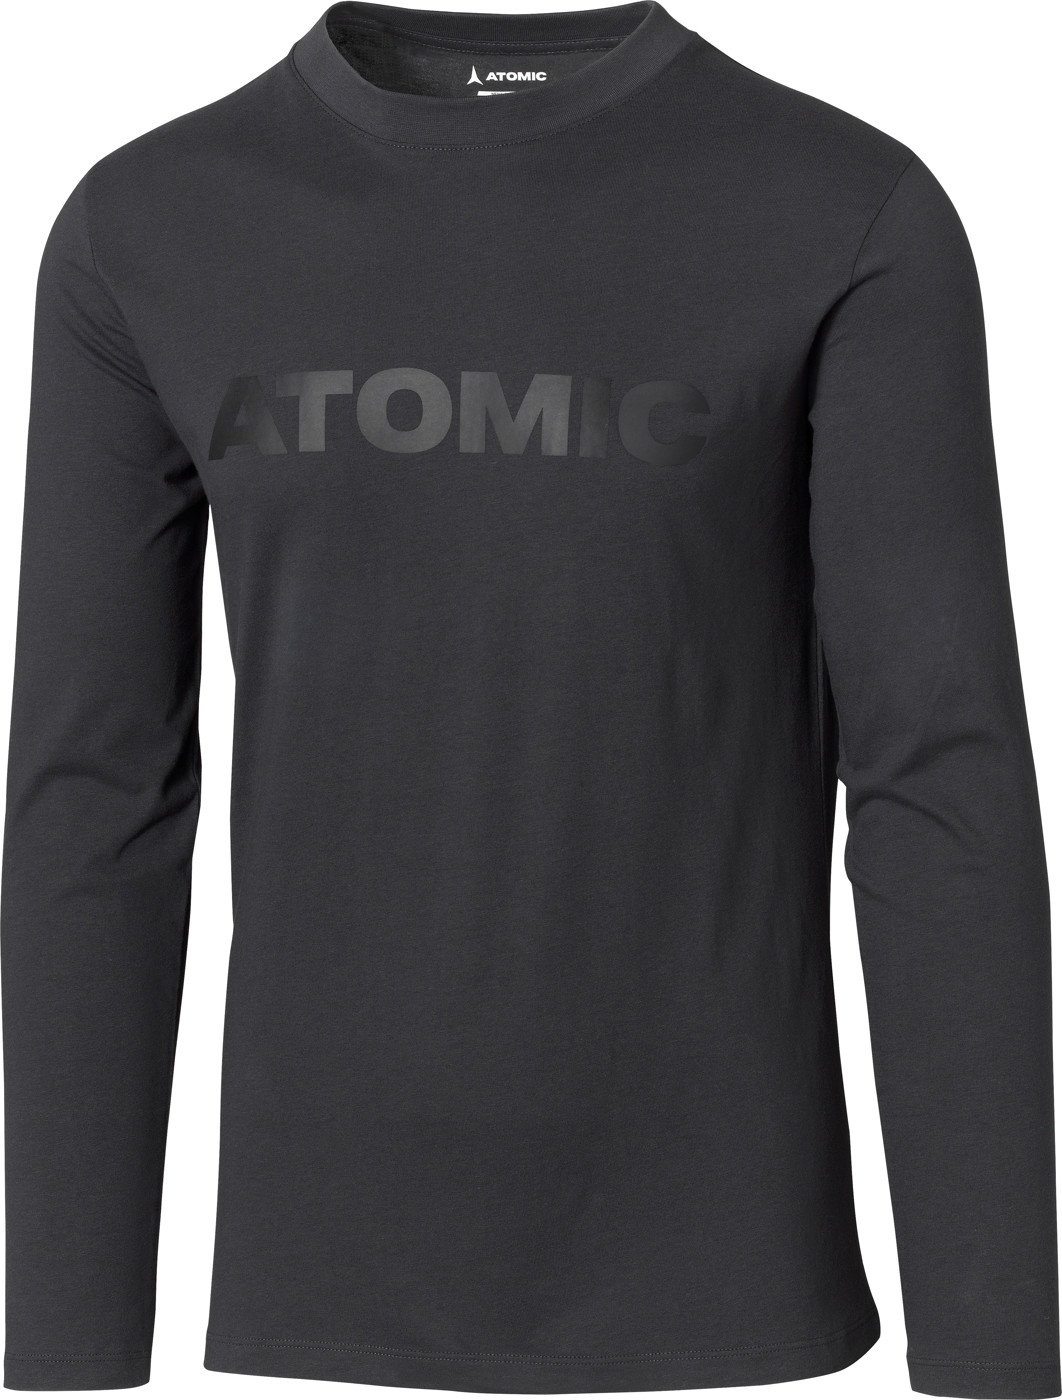 ATOMIC ALPS LS T-SHIRT Anthracite L - Herren